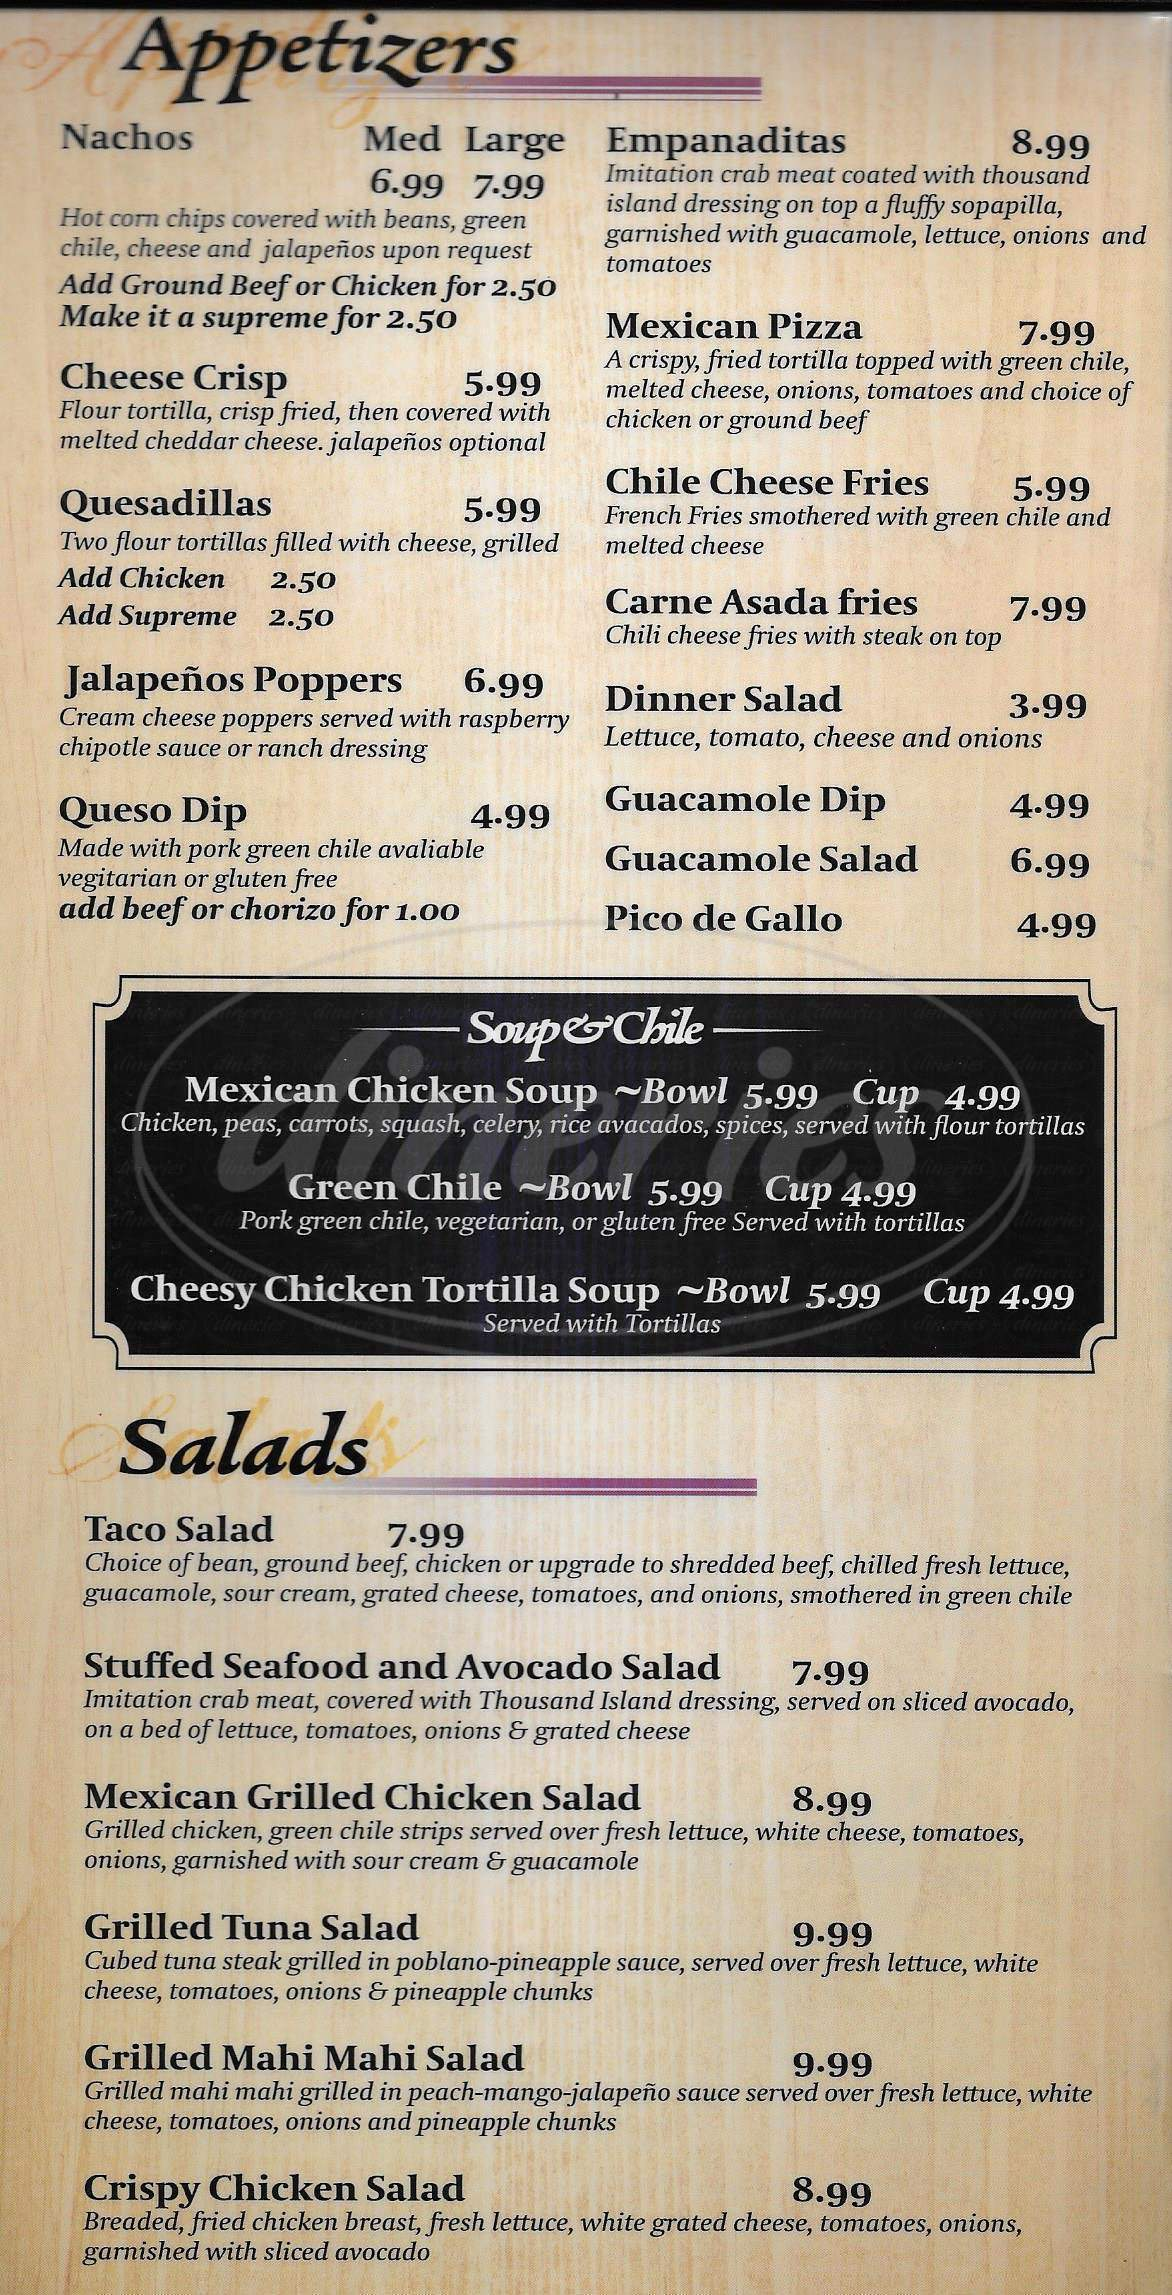 menu for Moose Hill Cantina